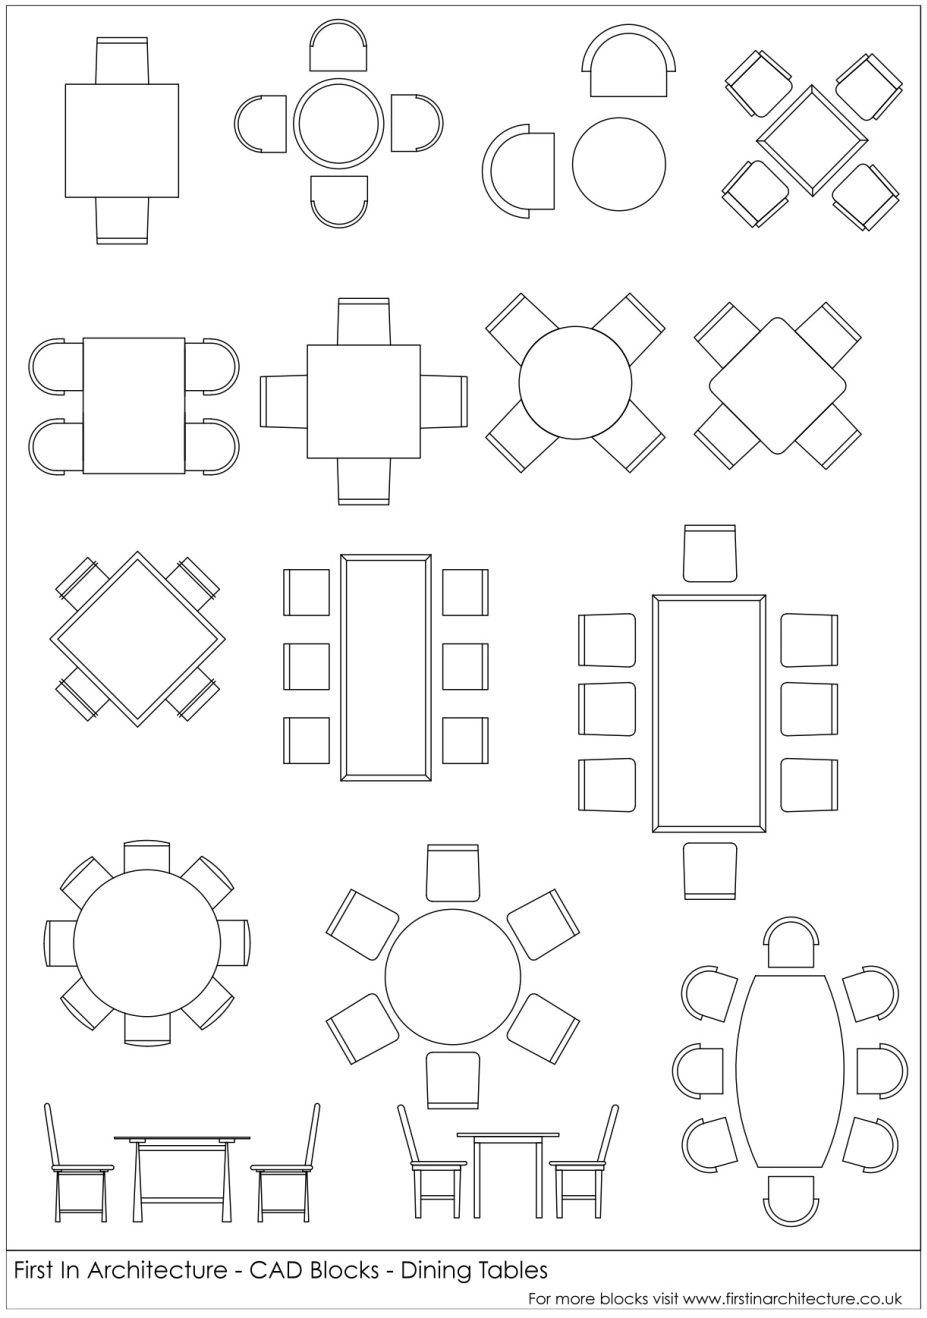 927x1318 Fia Cad Blocks Dining Tables Dimensions Autocad